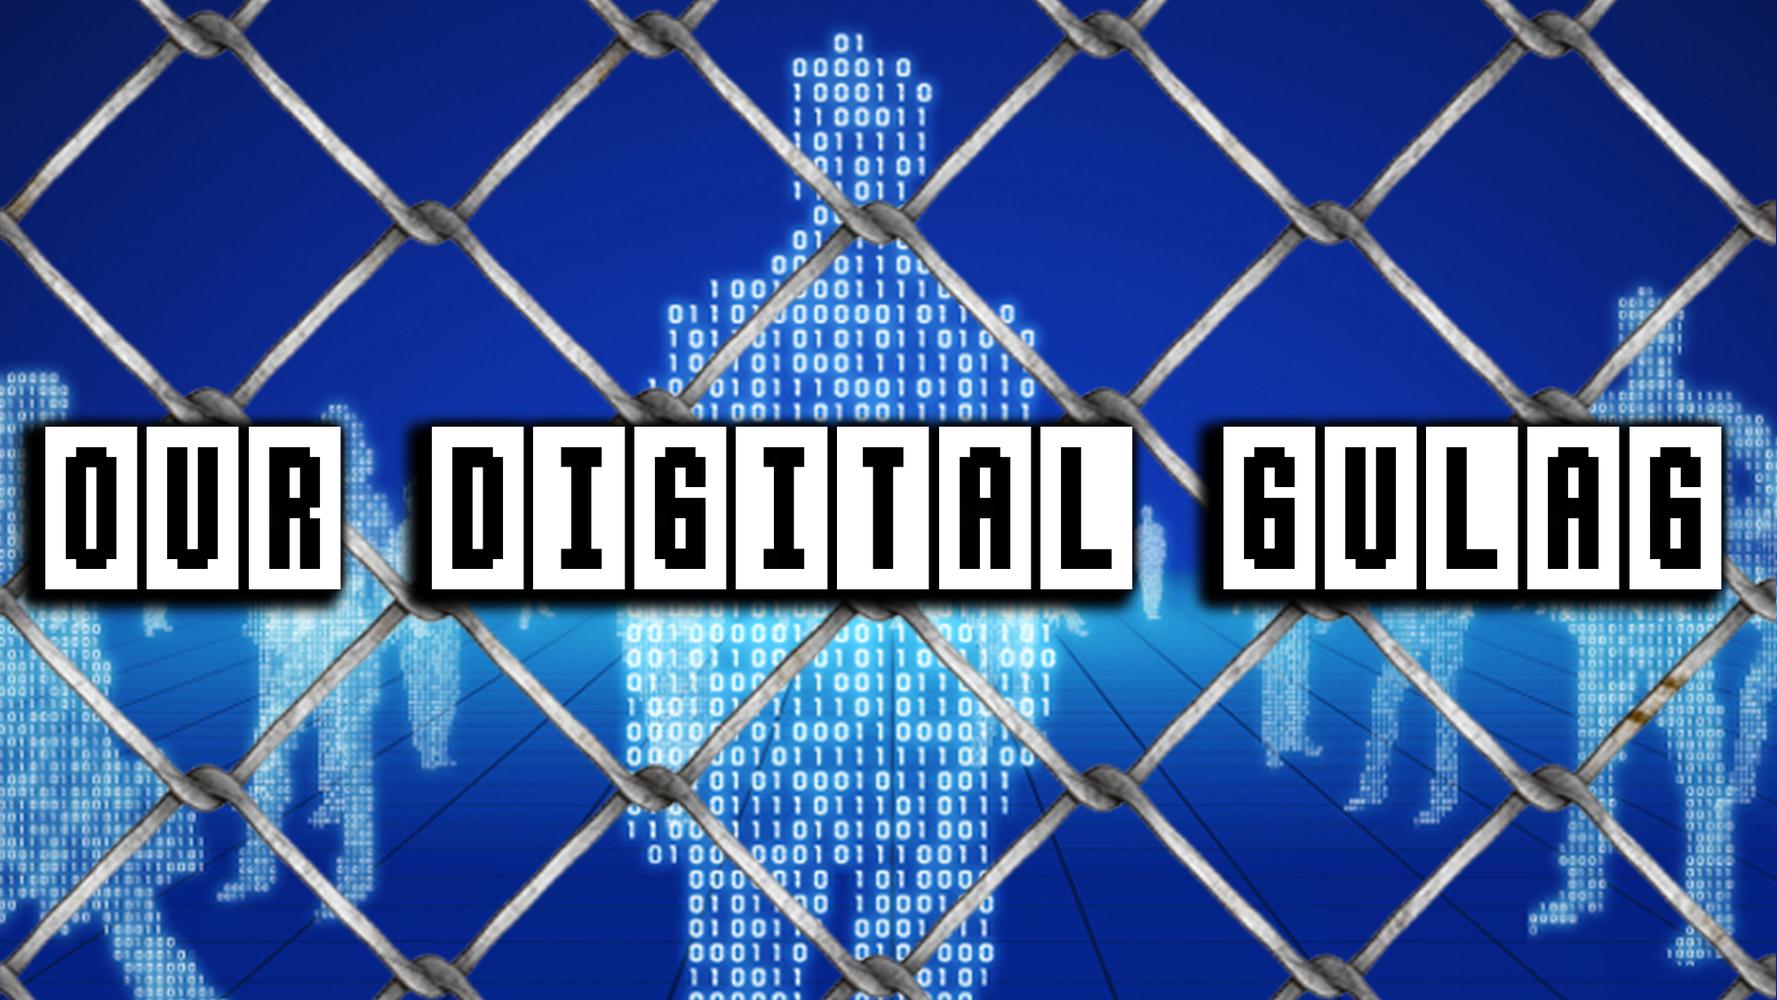 our-digital-gulag-|-minds